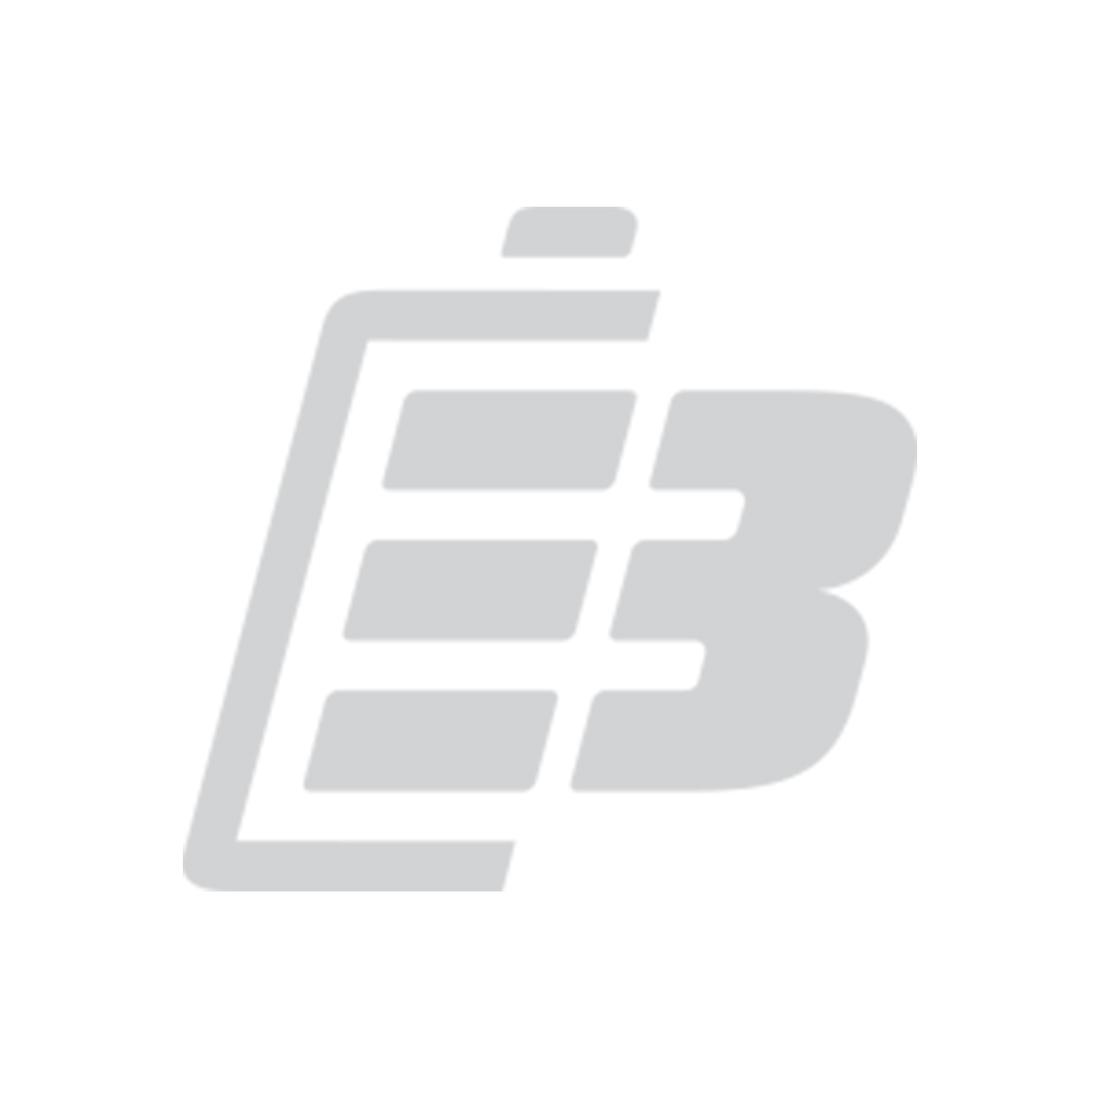 Silver Oxide image